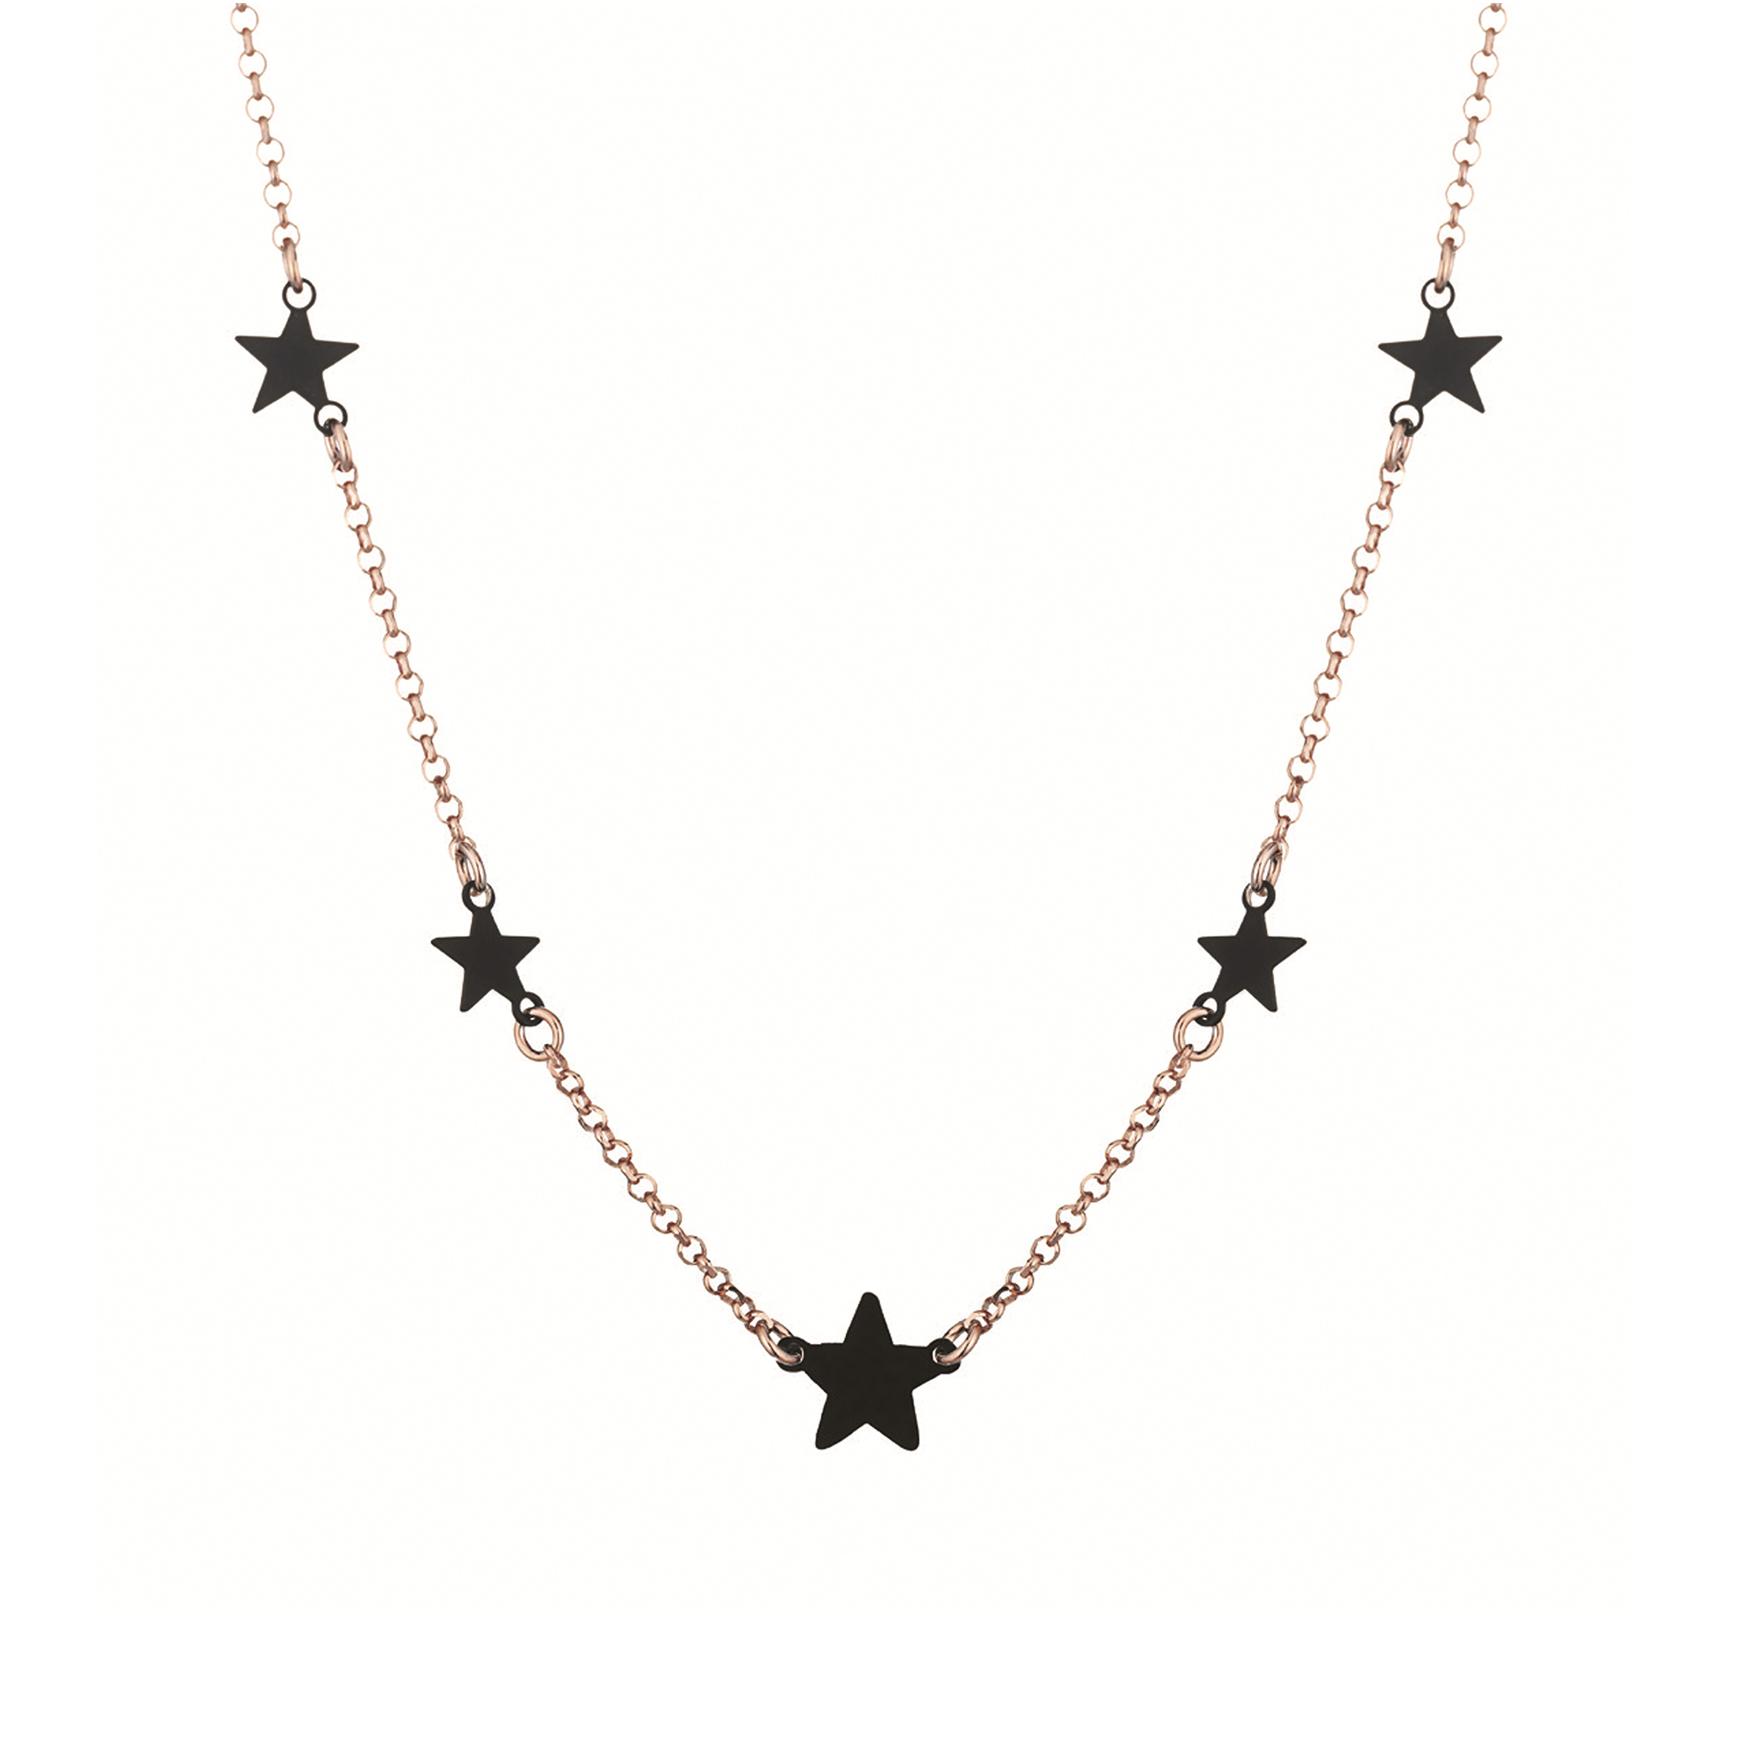 Sensi joyas high top jewellery Granada silver engagementRose Gold